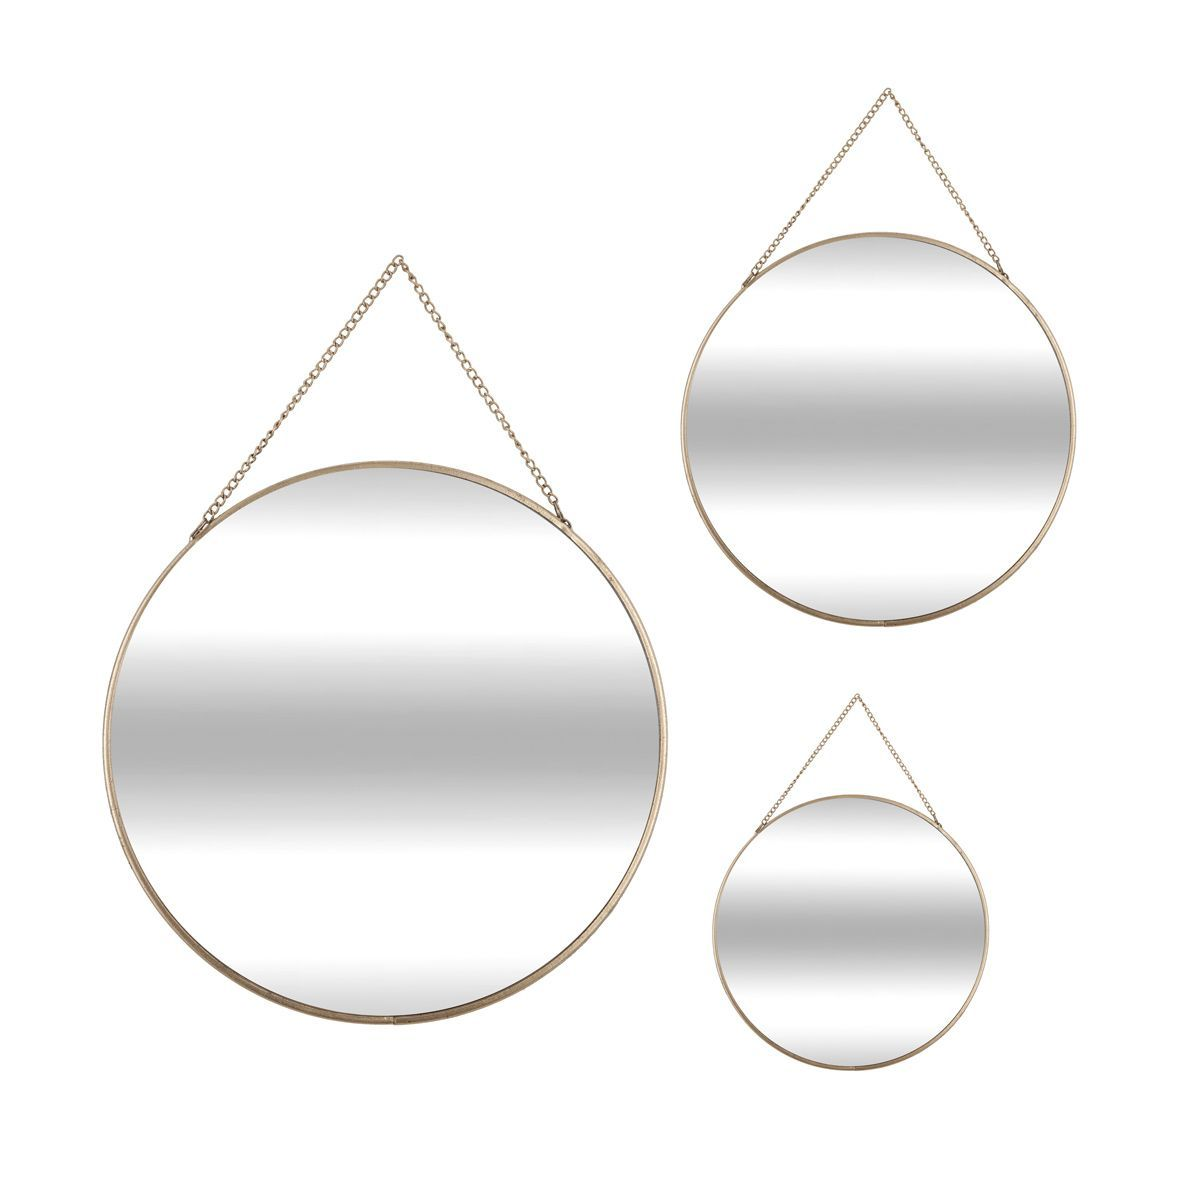 Lot 3 miroirs ronds métal doré